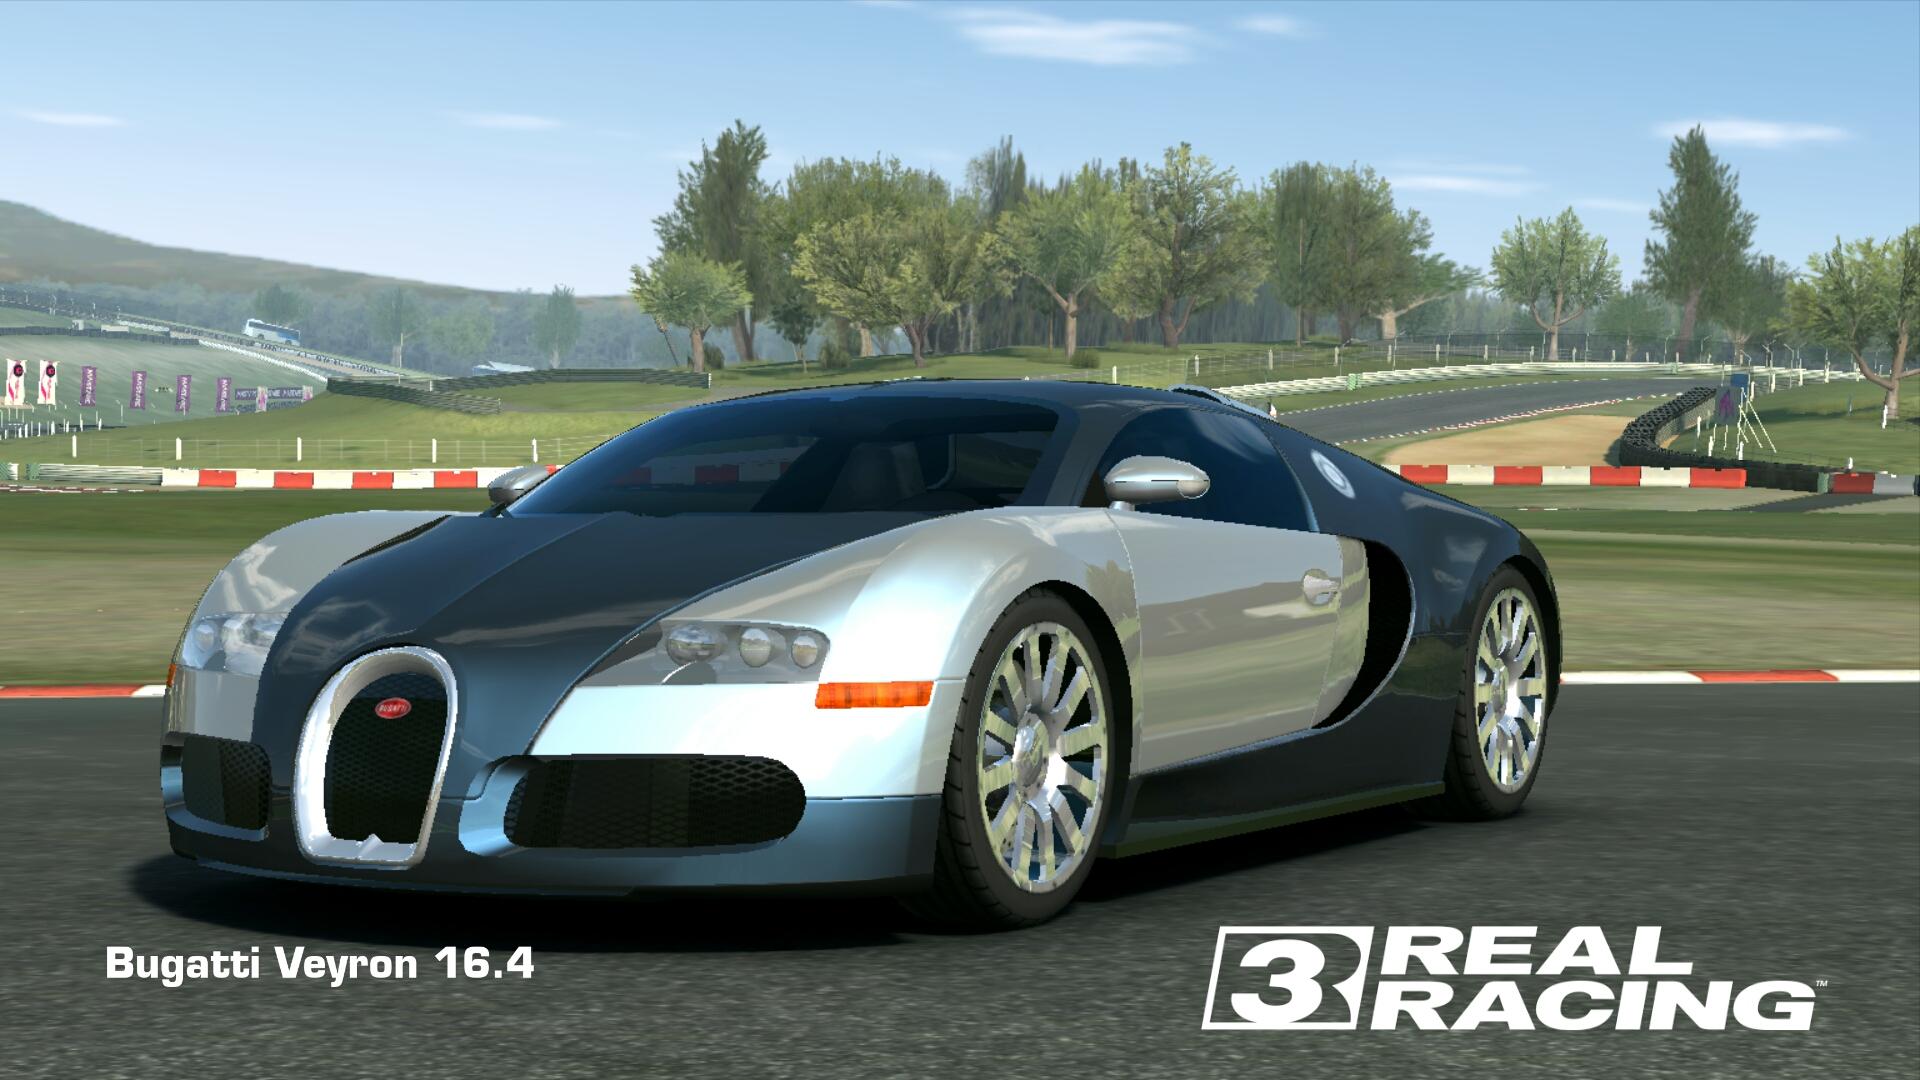 Showcase Bugatti Veyron 16.4